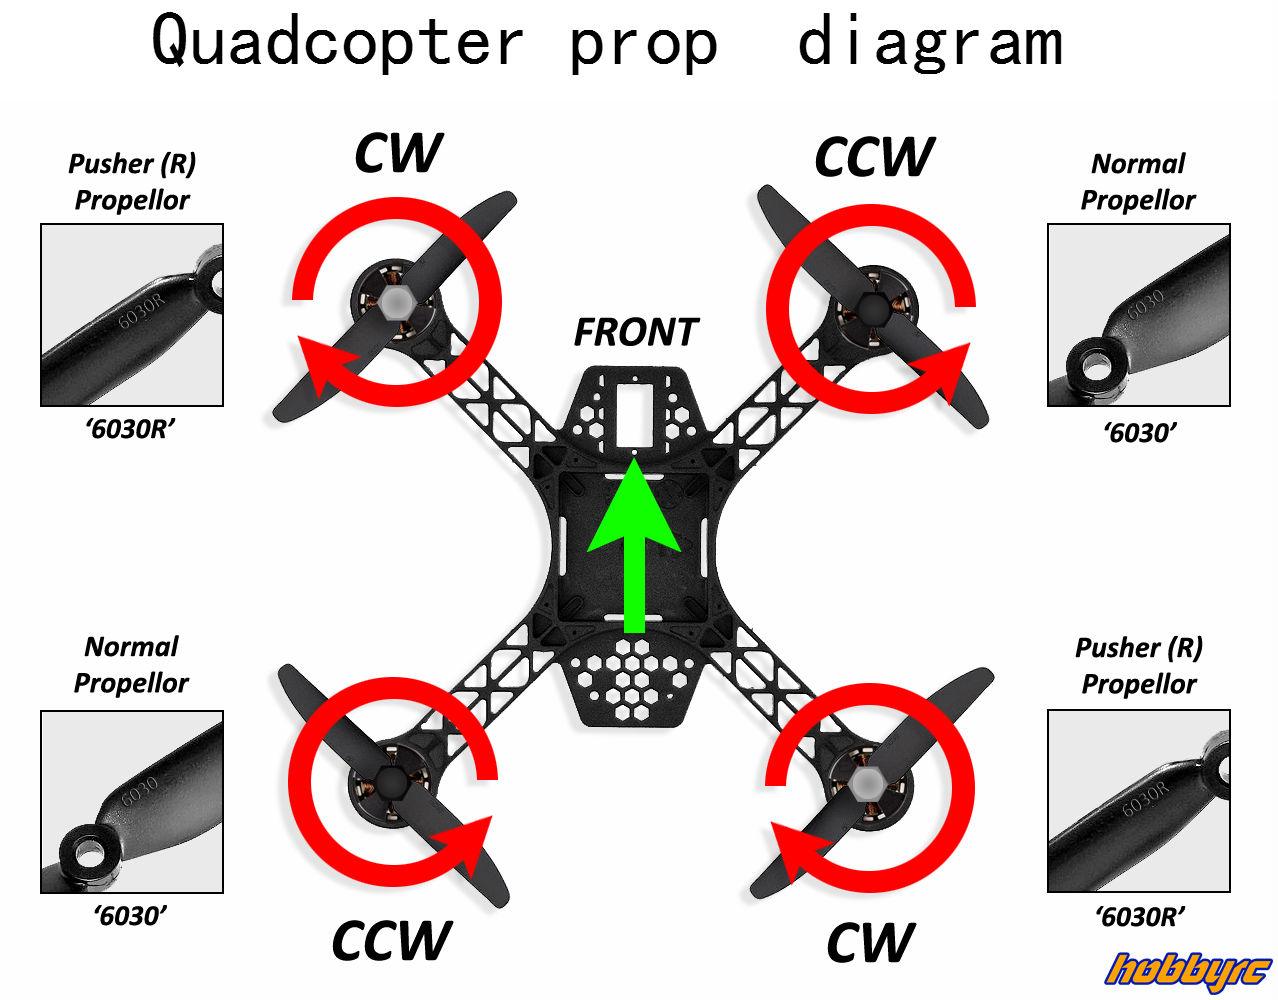 fpv quadcopter wiring diagram 1972 honda ct70 guide rcdronegood